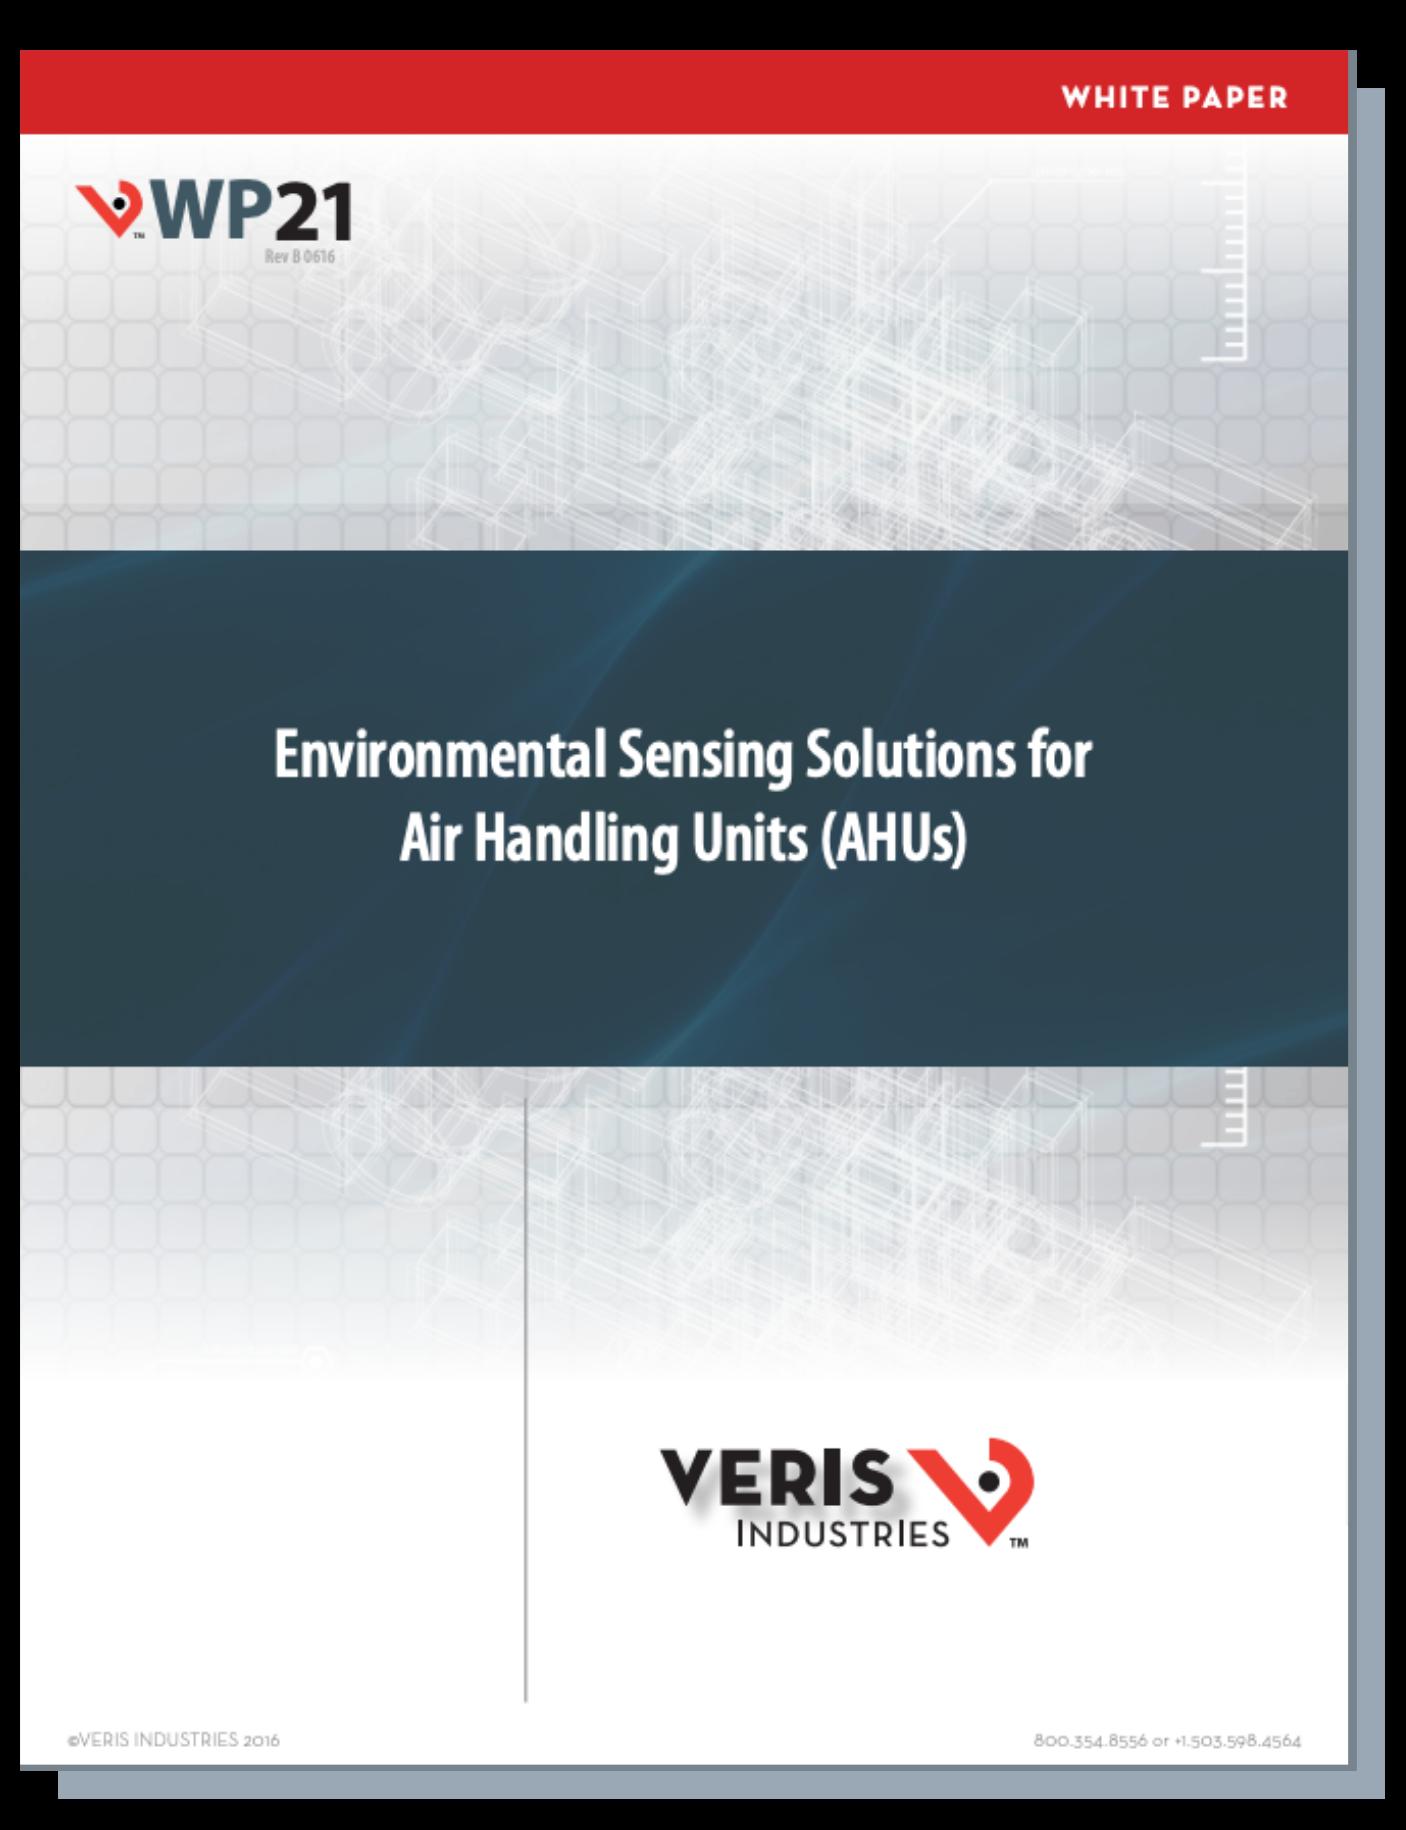 Environmental Sensing Solutions for Air Handling Units Mock Up-1